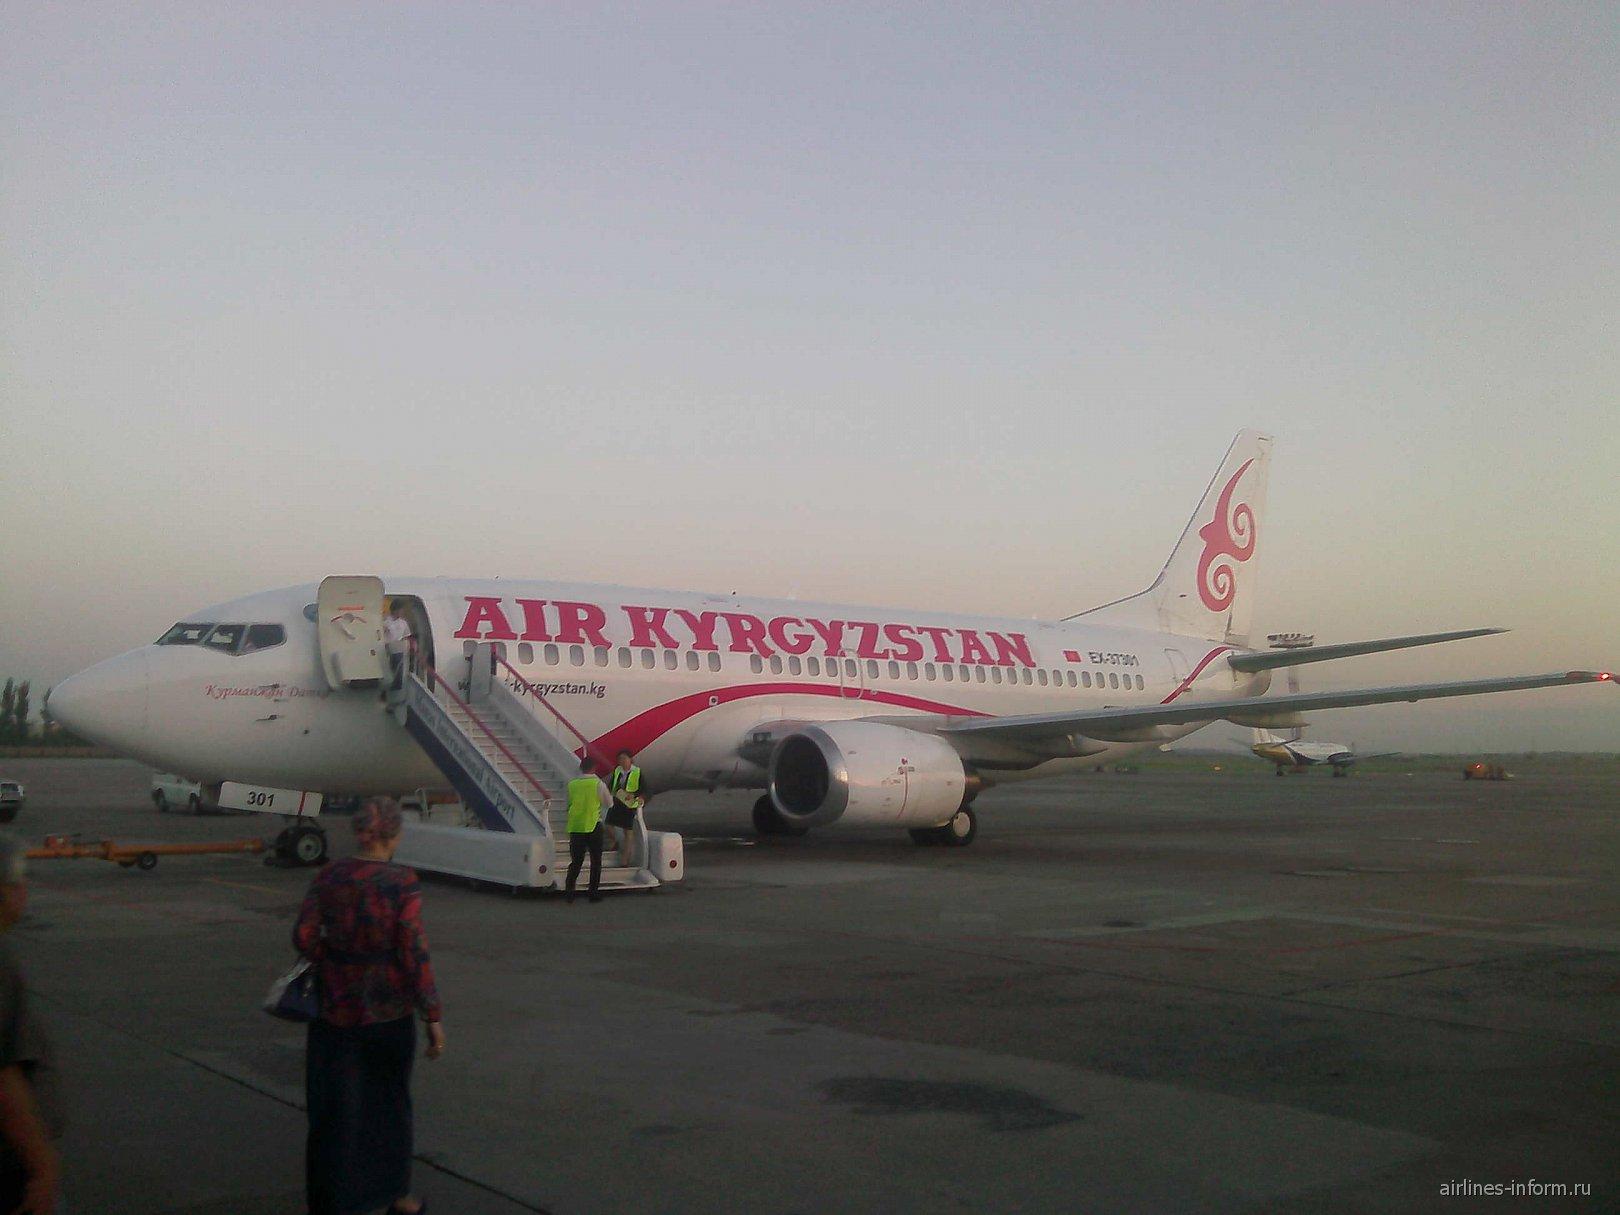 Боинг-737-300 авиакомпании Air Kyrgyzstan